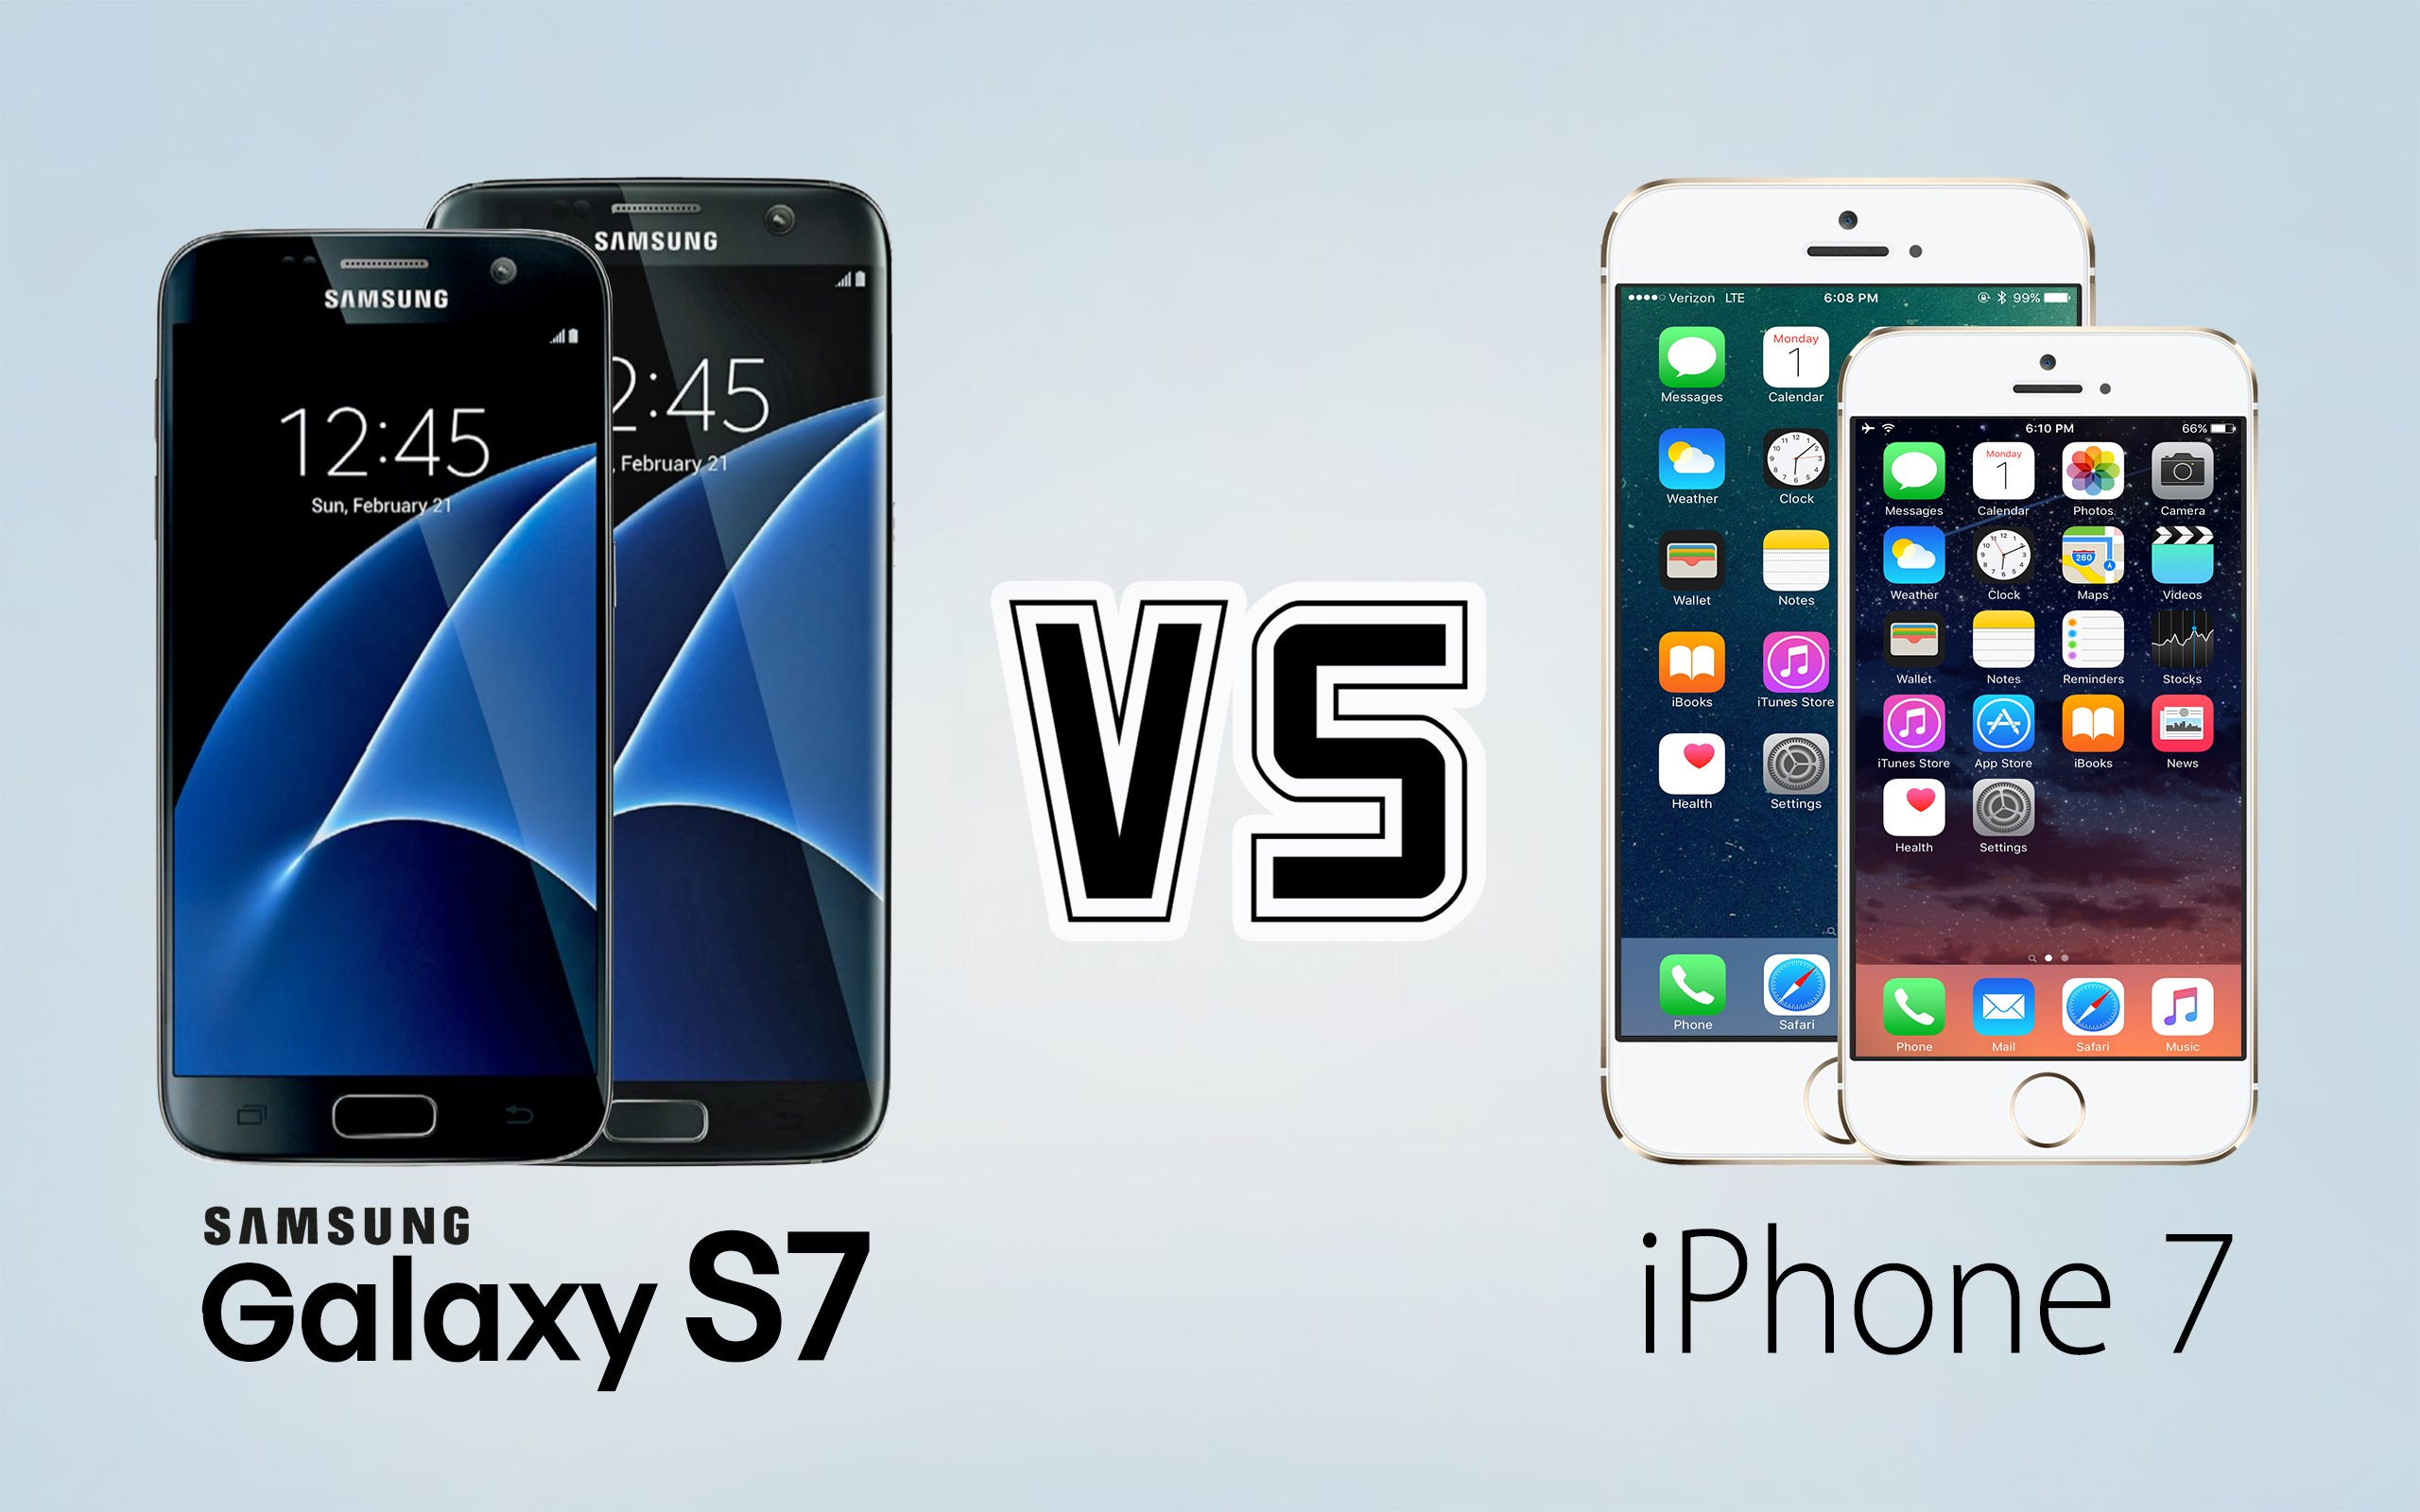 VIDEO: iPhone 7 VS Galaxy S7 intr-un test de supravietuire subacvatica